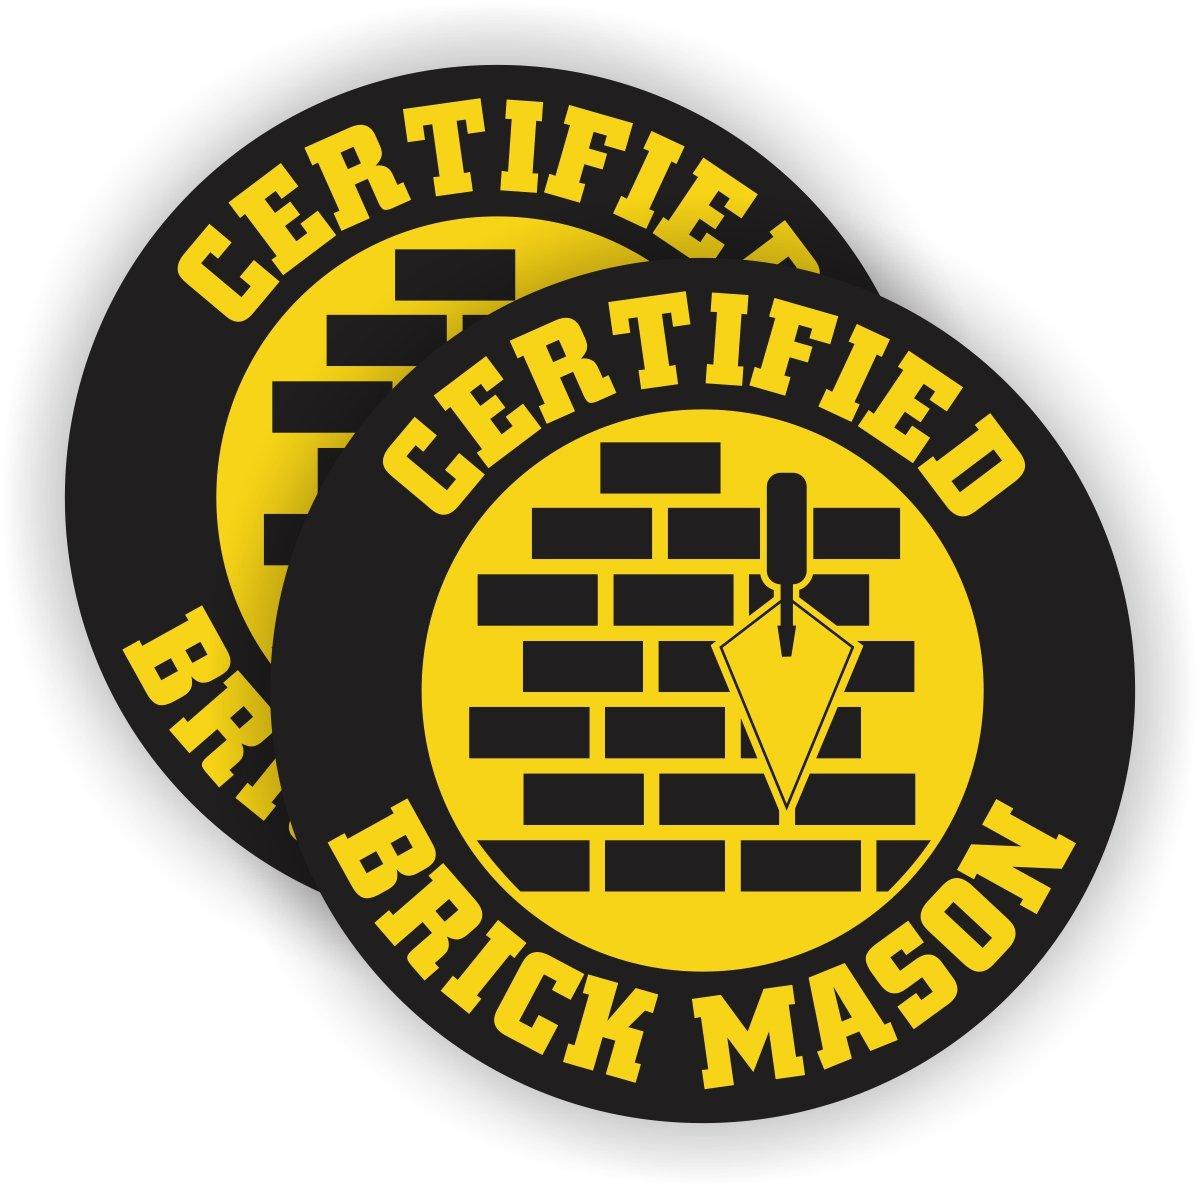 fa80e8a4199 Certified Brick Mason Hard Hat Sticker